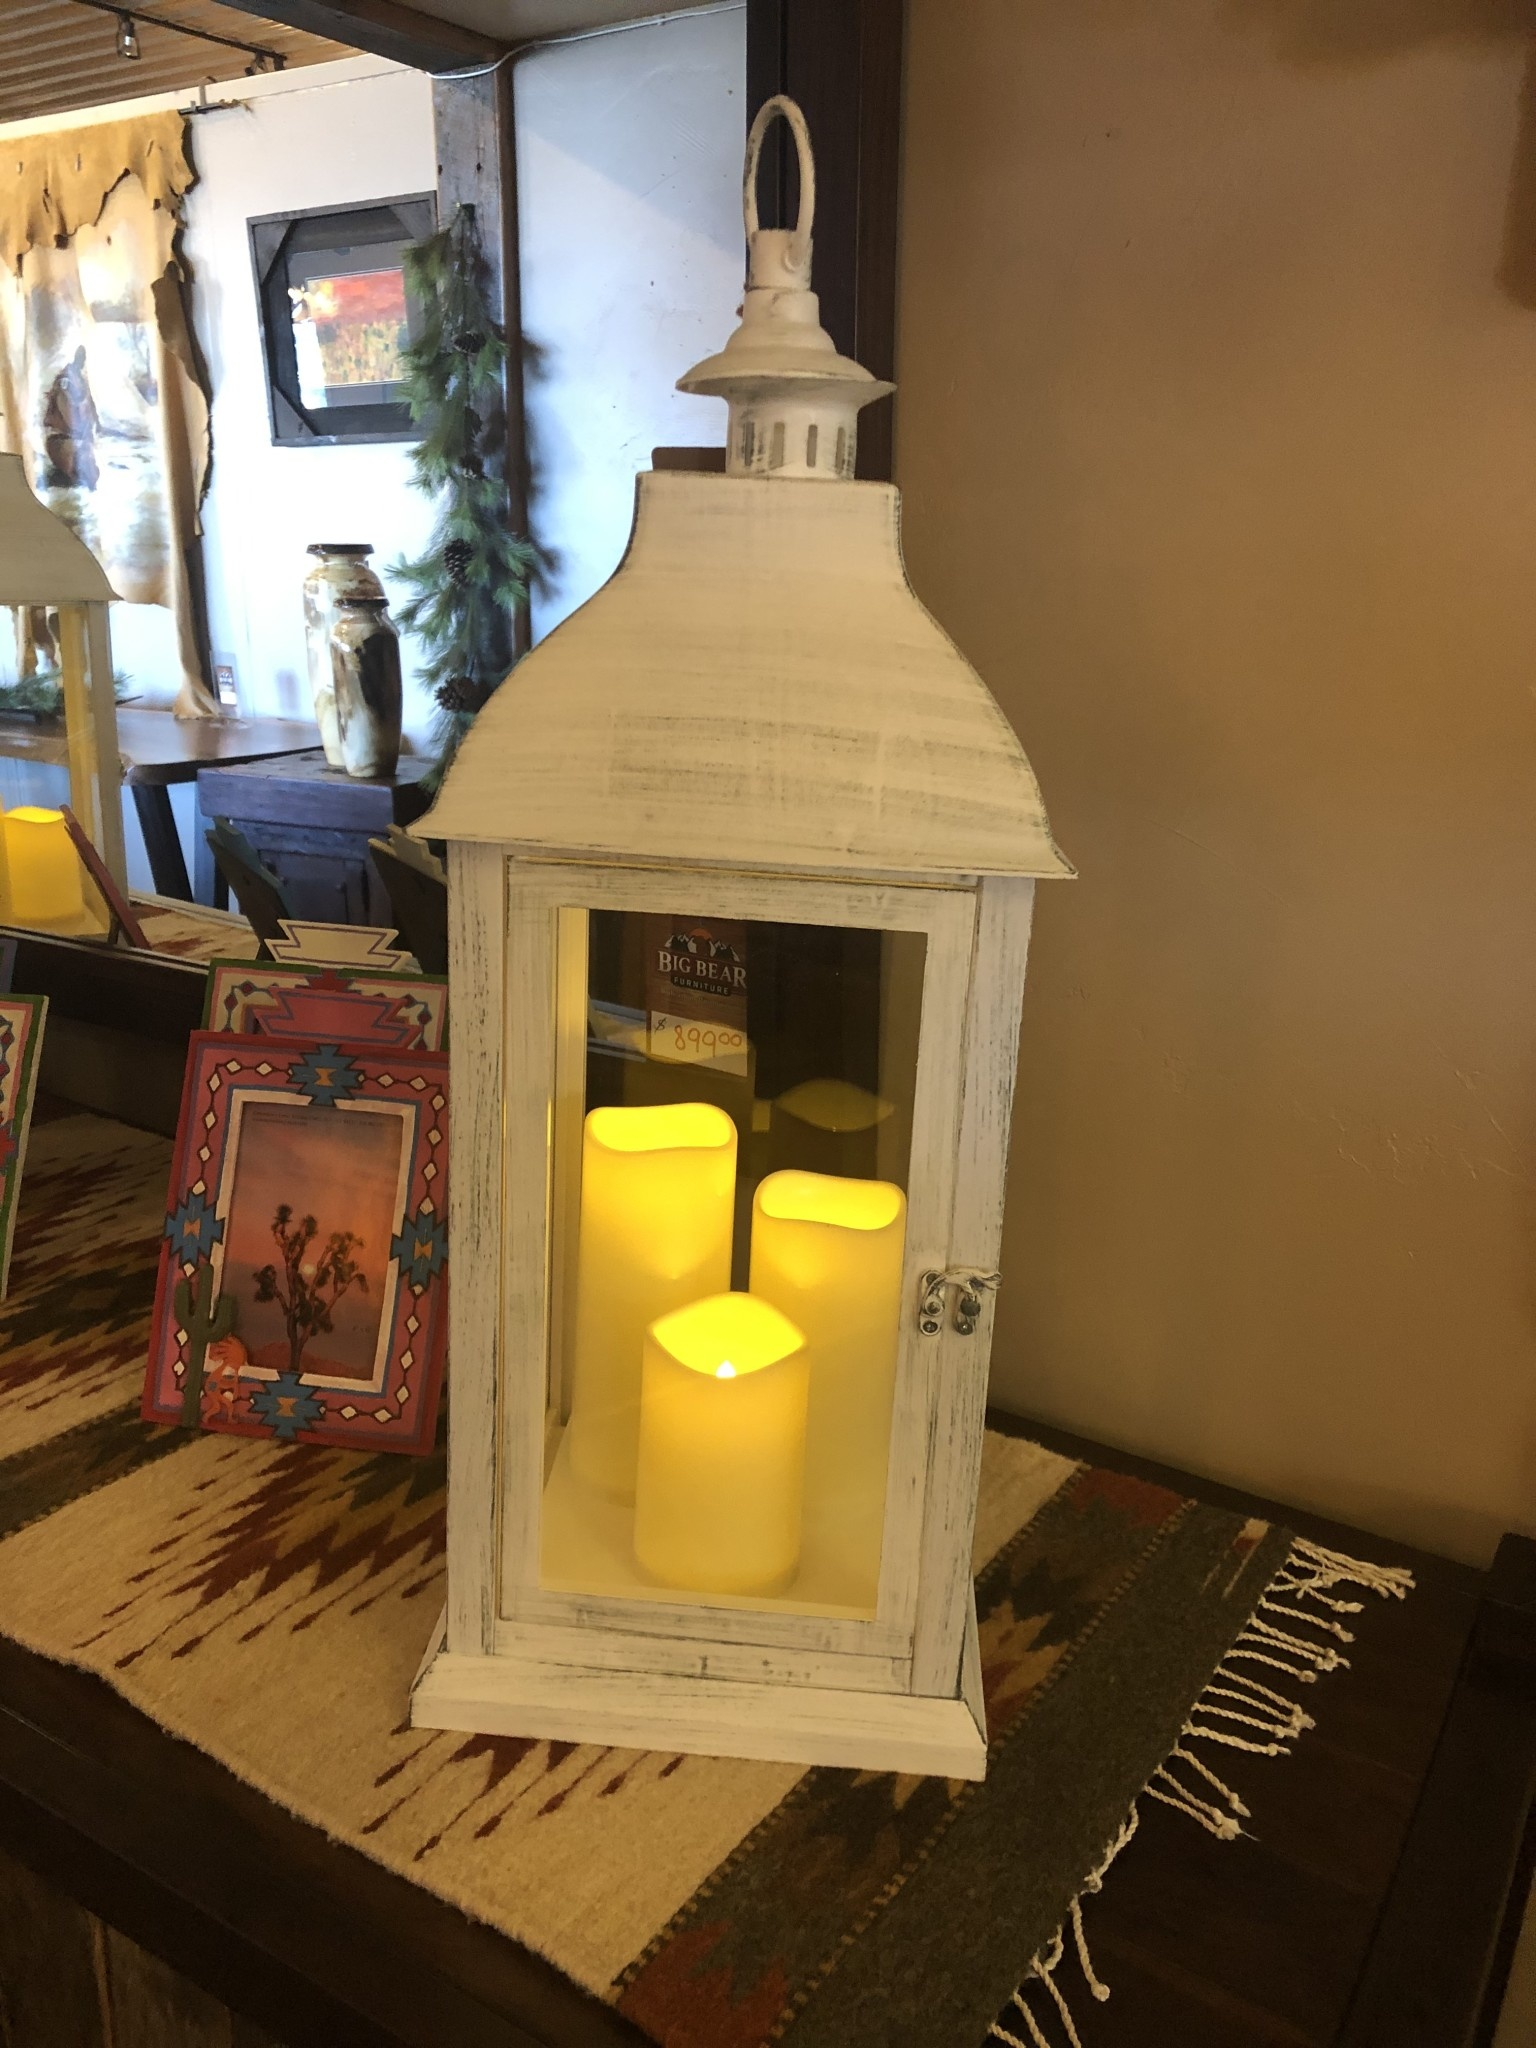 Sullivans Jumbo Candle Lantern w/3 Pillars - White